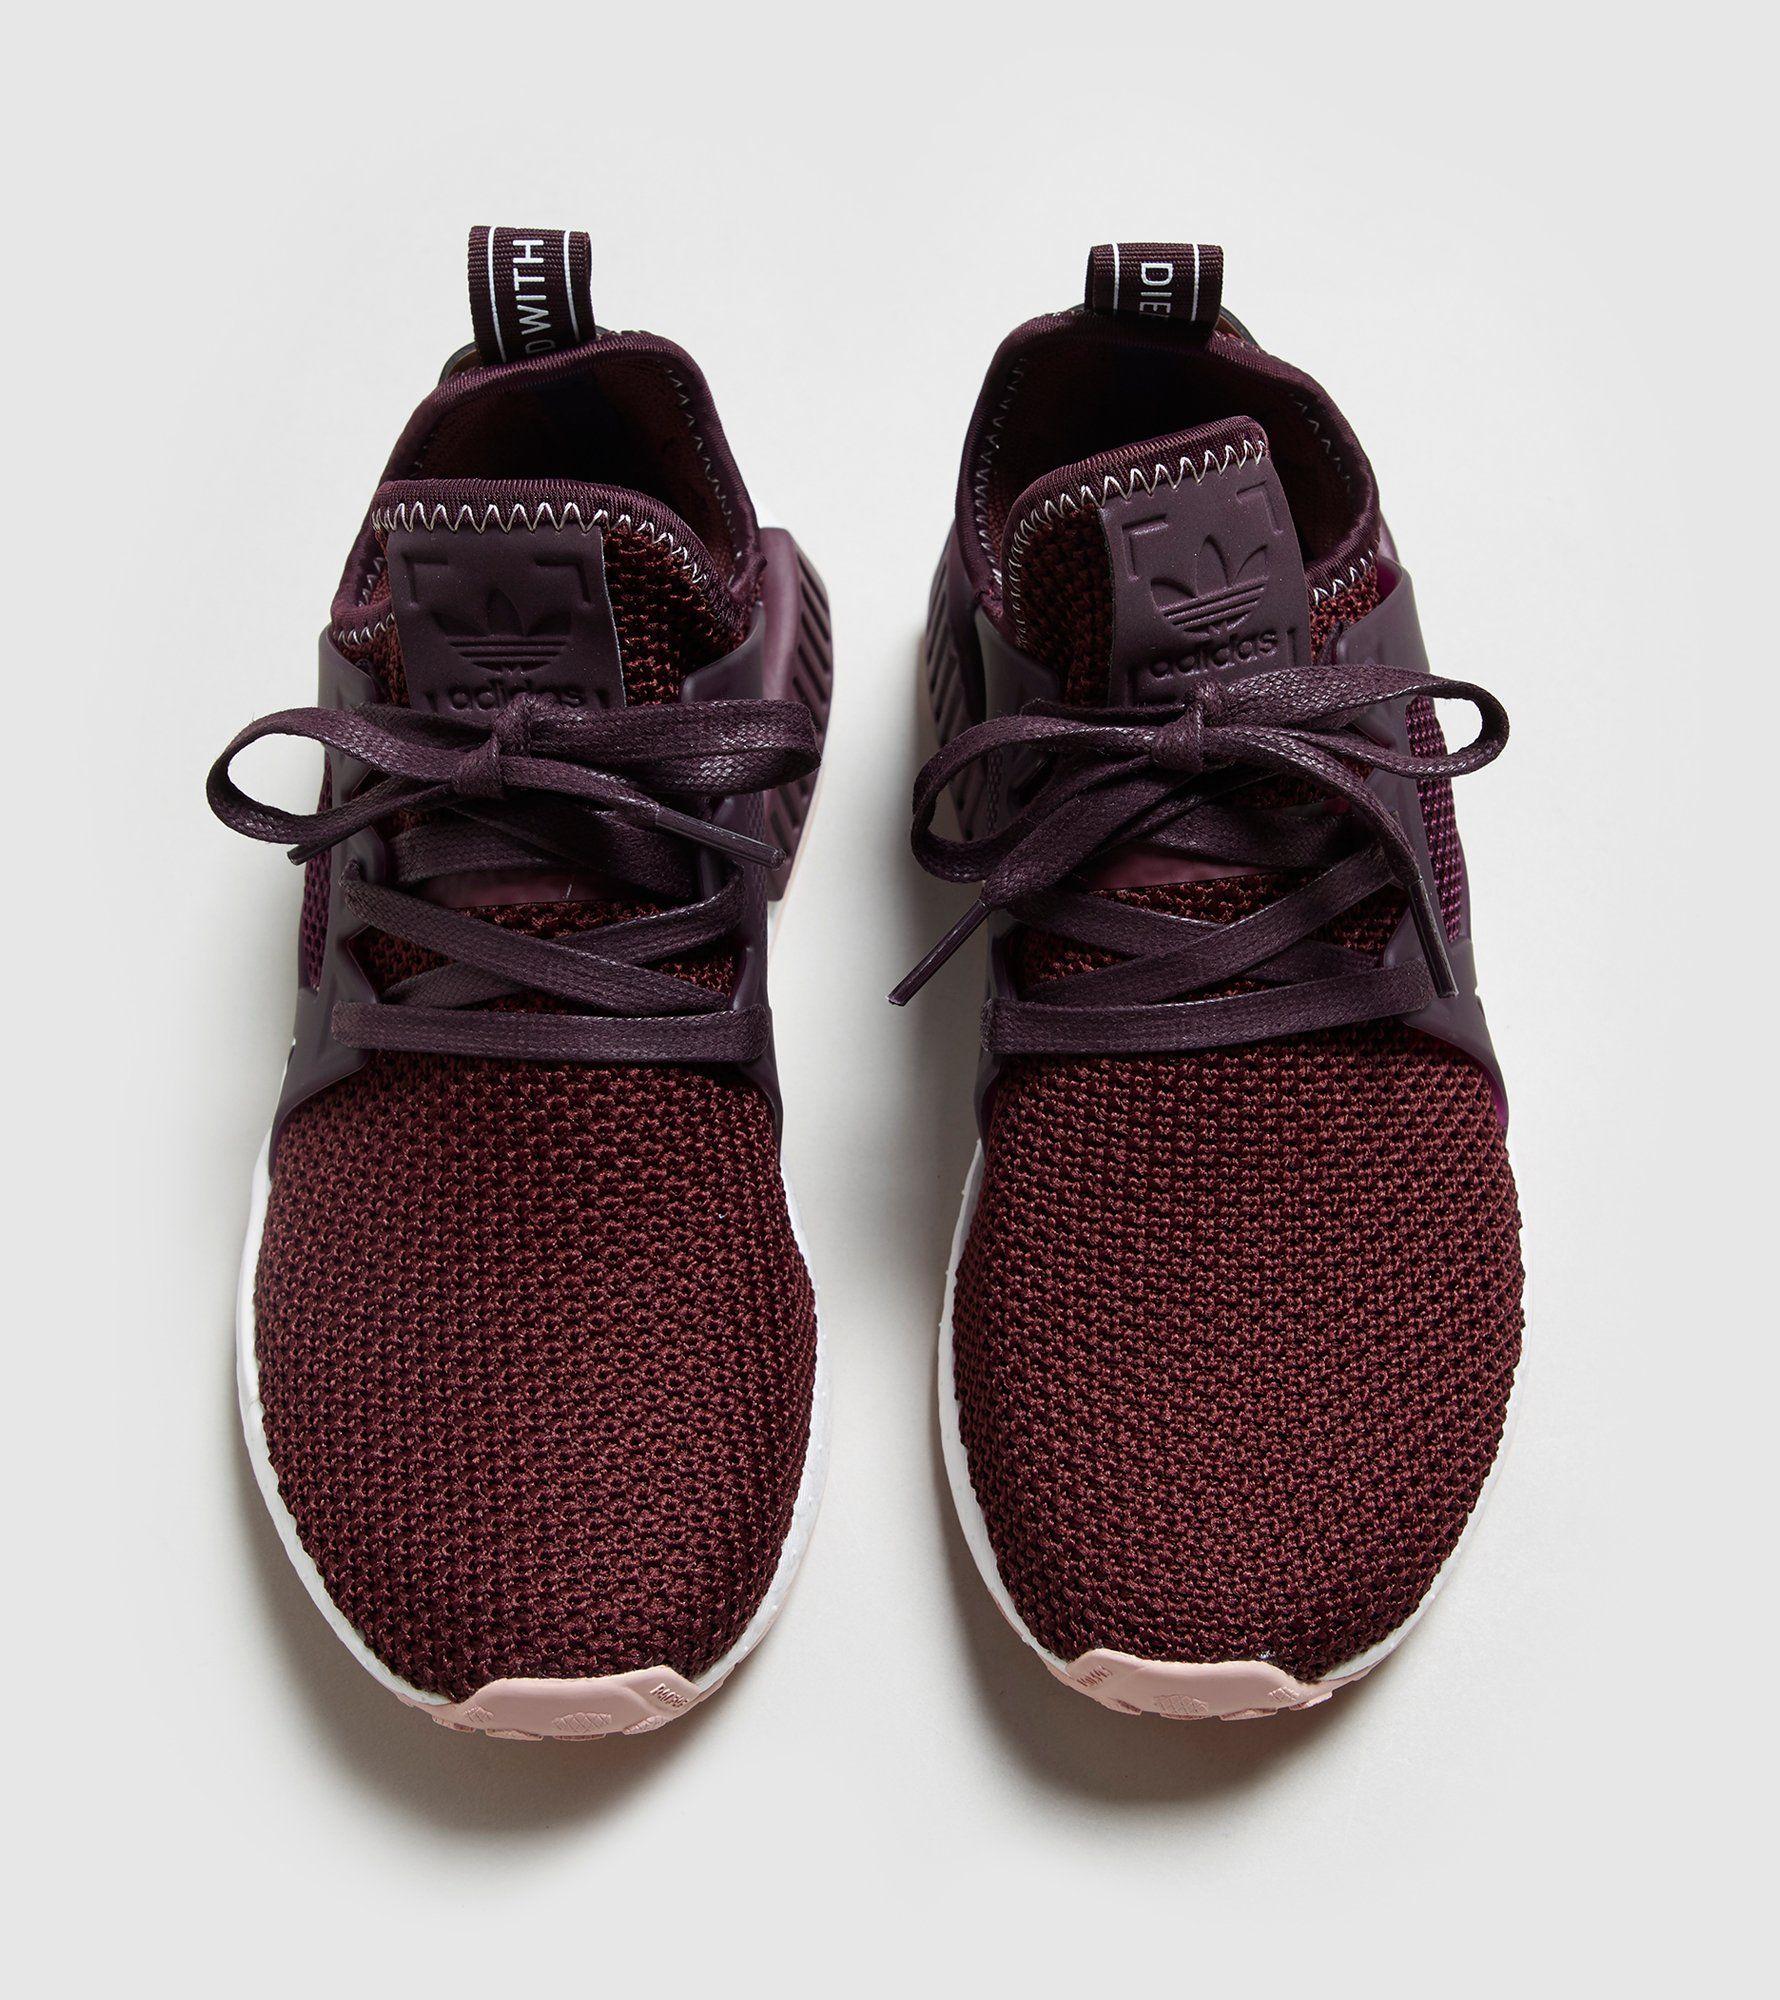 Adidas nmd rt primeknit donne bb2367 ghiaccio metà viola